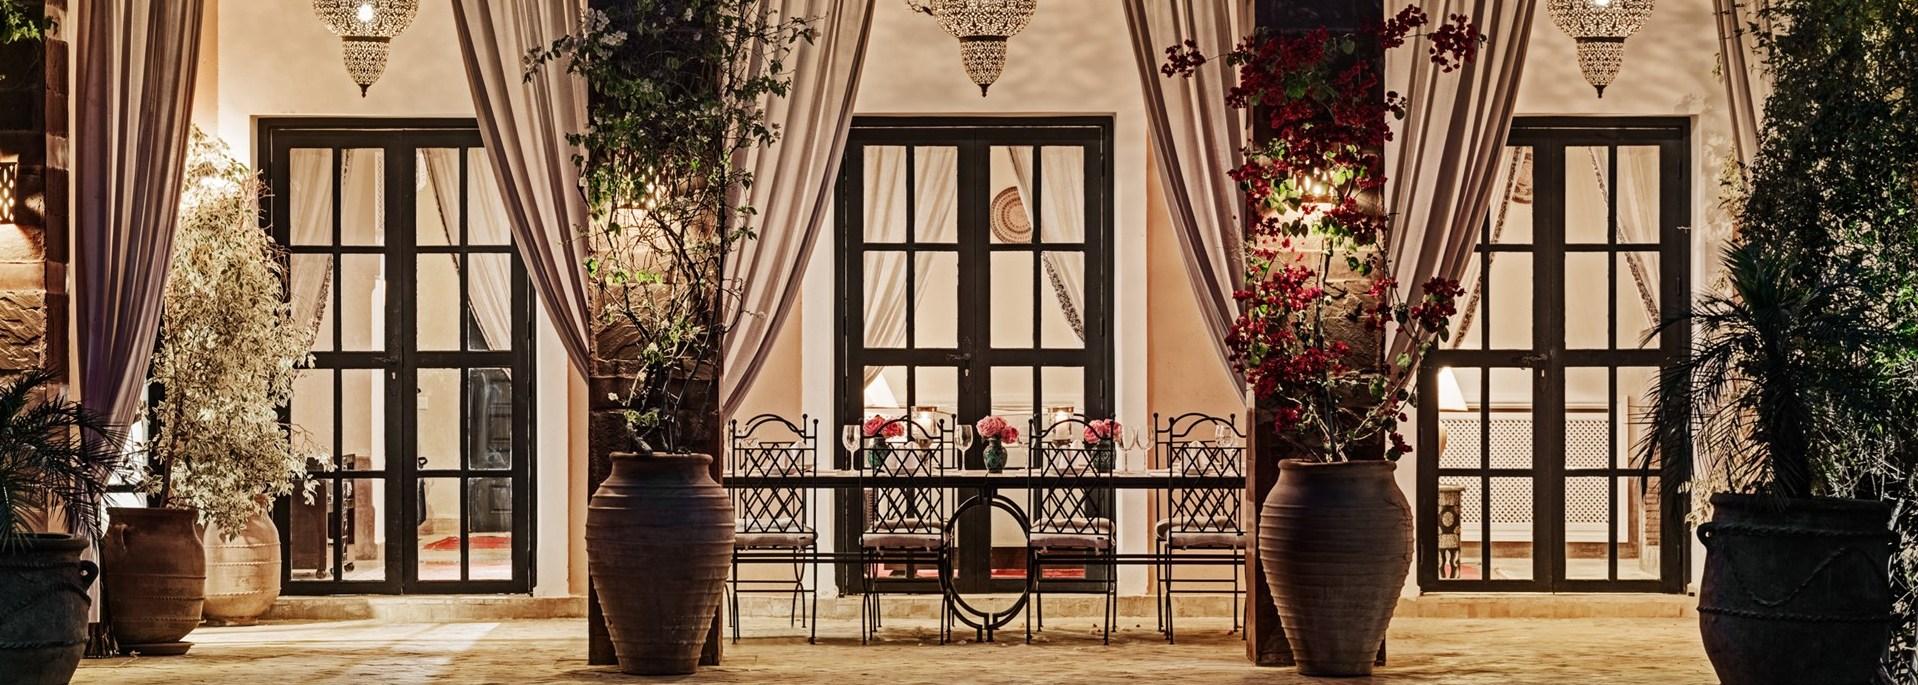 villa-dar-tamazerte-outdoor-dining